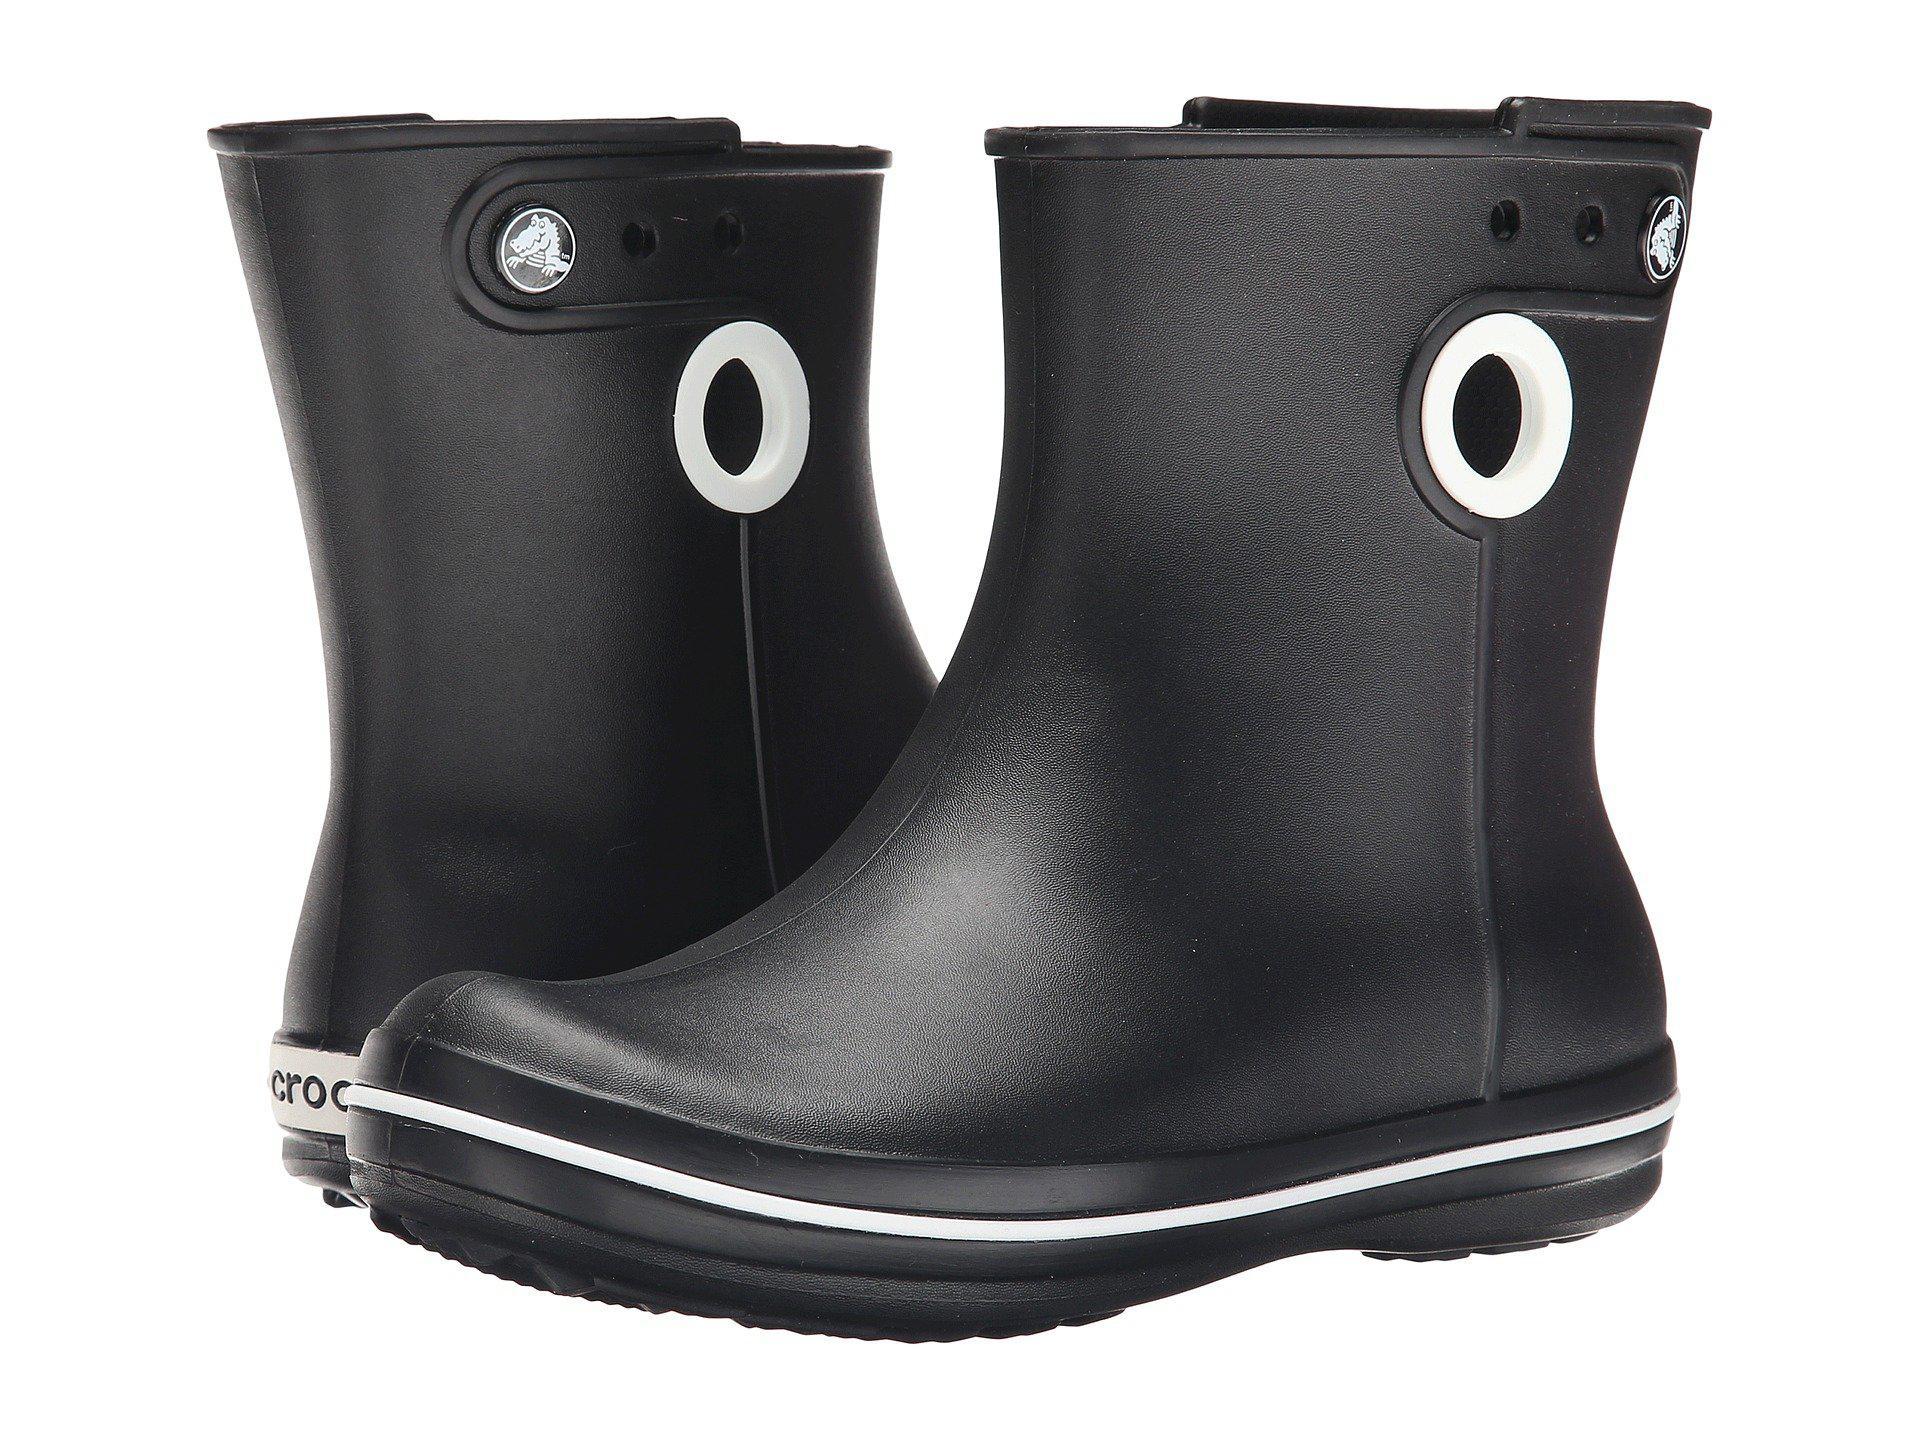 a55a91fa2db72a Lyst - Crocs™ Jaunt Shorty Warm Lining Rain Boots in Black - Save 26%